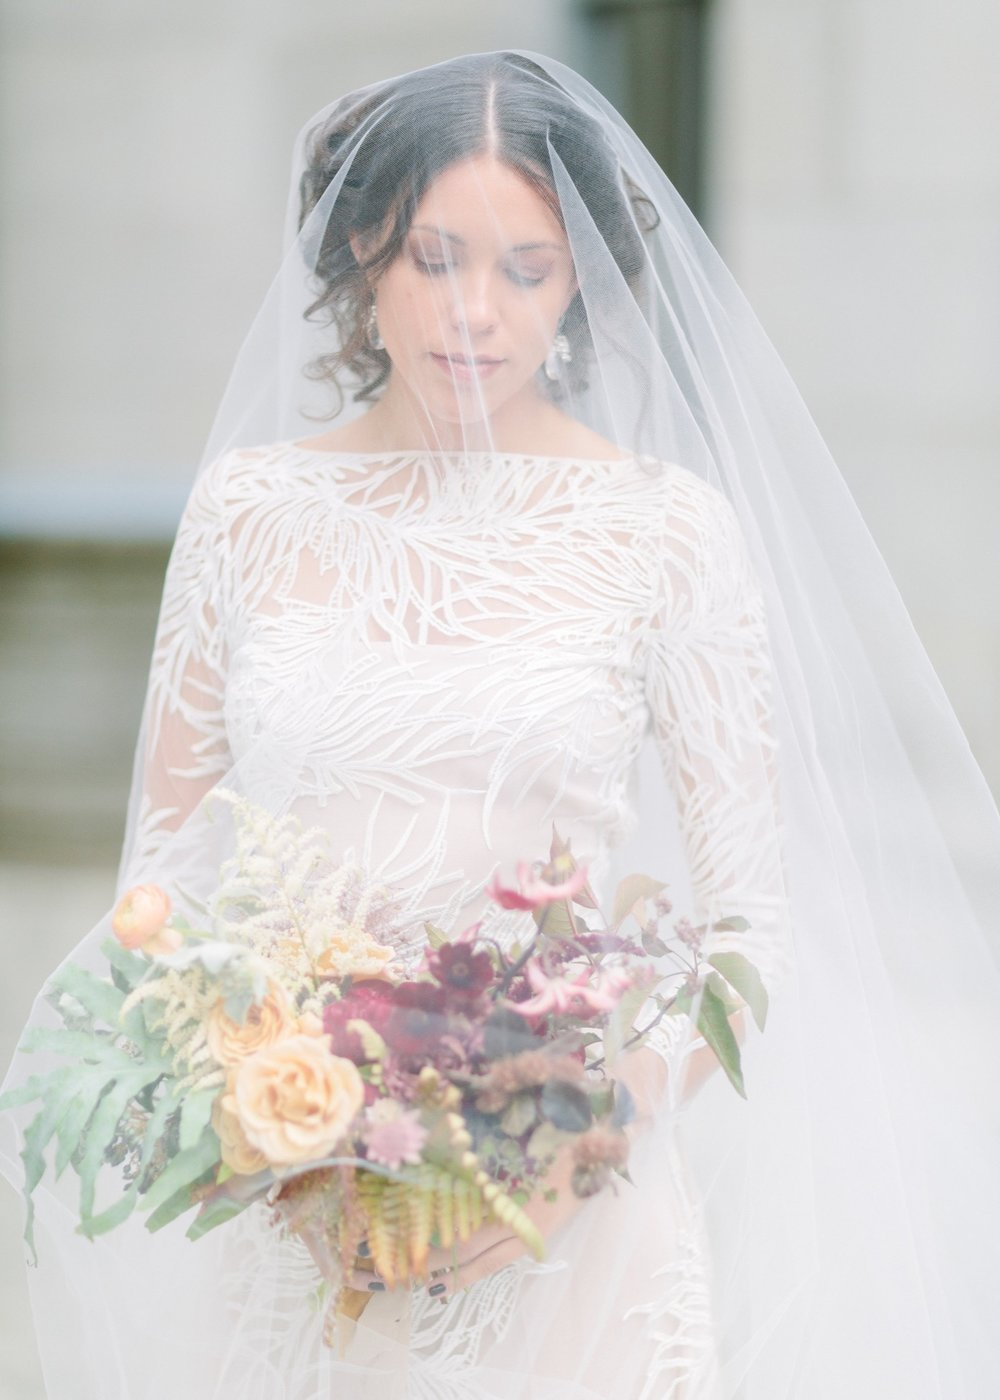 Mint Photoshoot - Photographer /// Larissa ClevelandPublished: Today's Bride, print version and Green Wedding Shoes